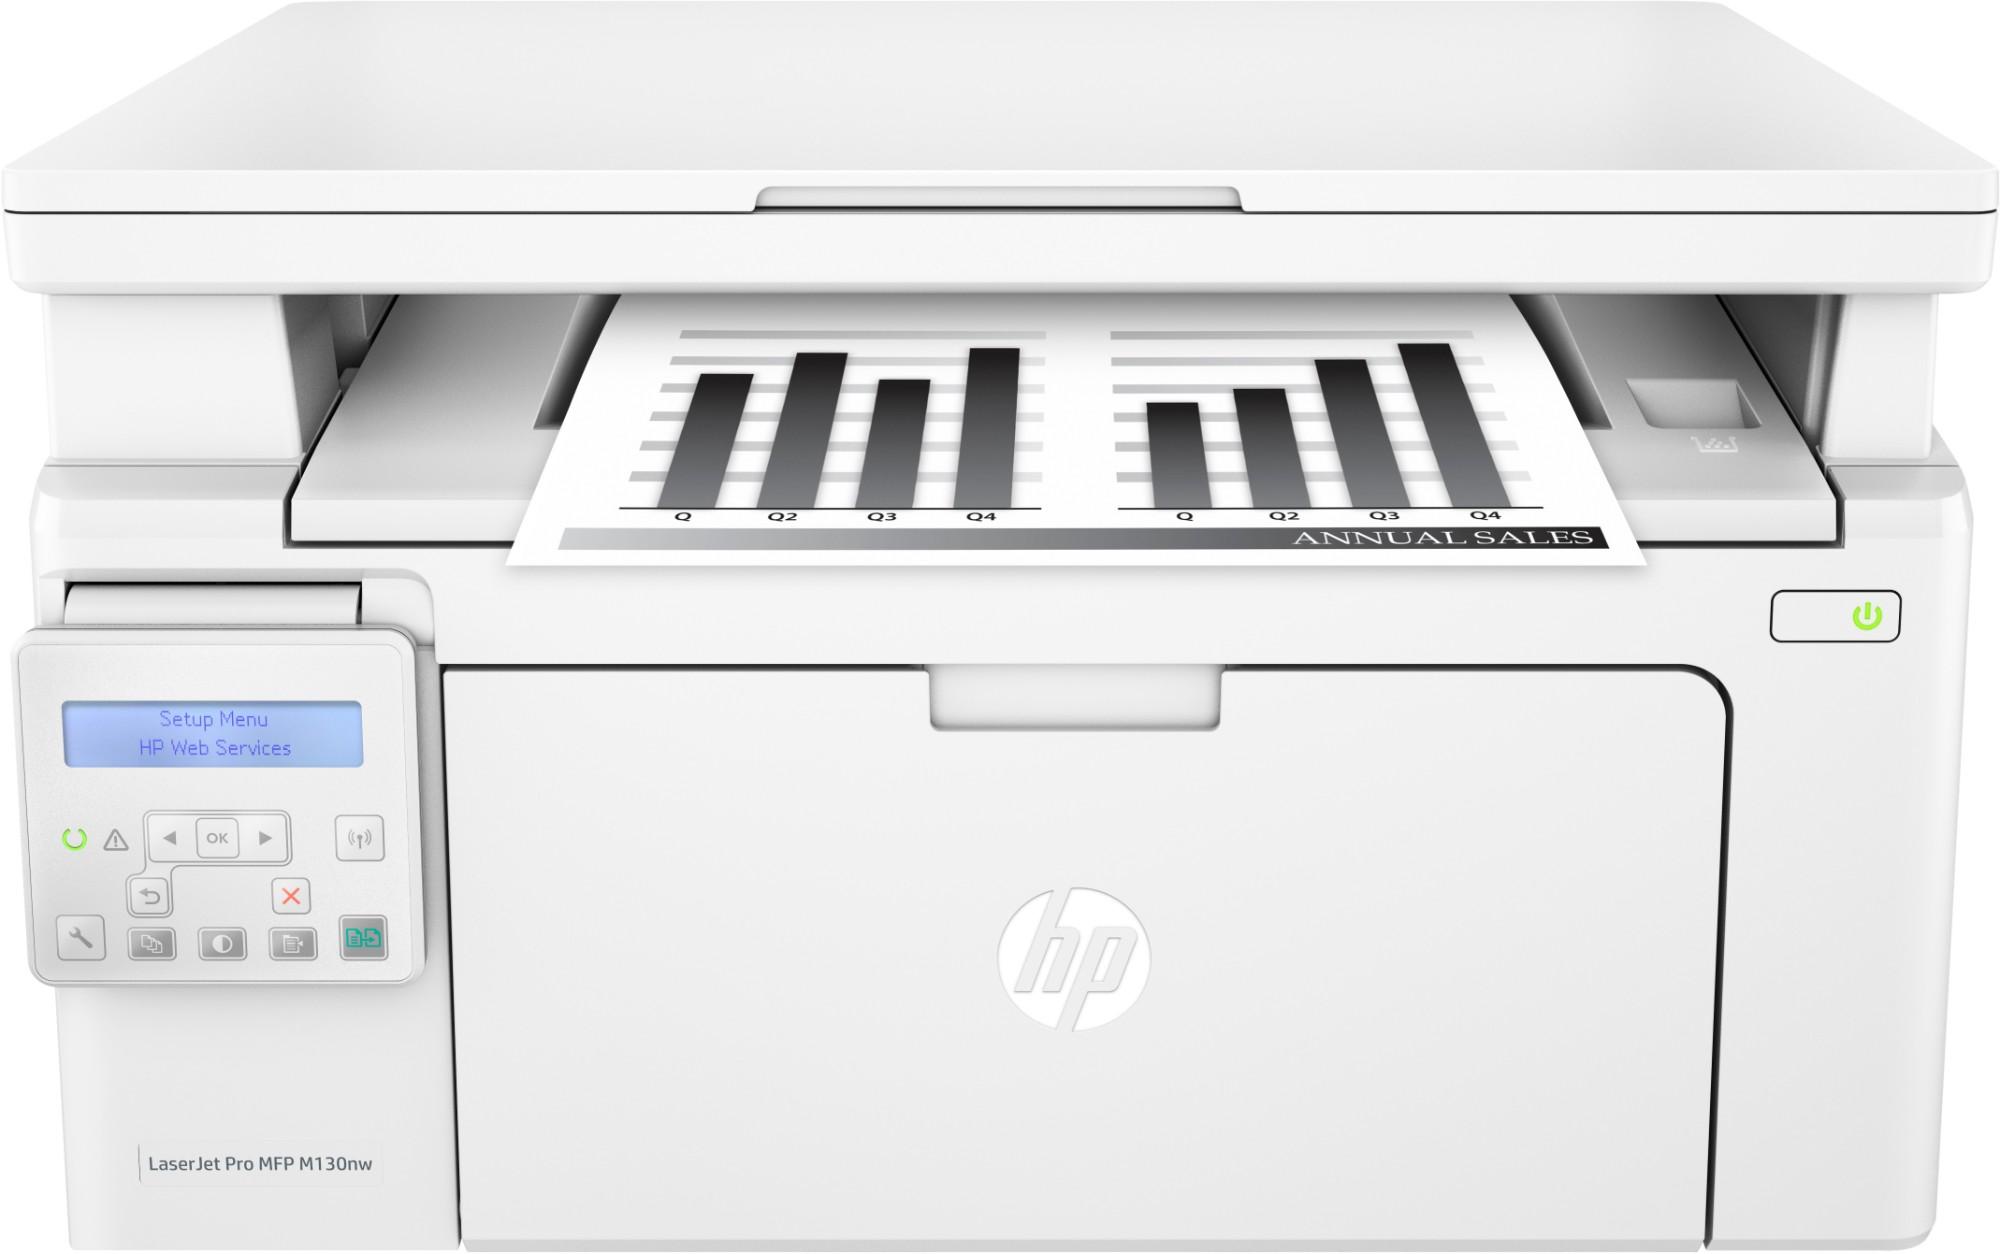 HP LaserJet Pro M130nw Laser 22 ppm 1200 x 1200 DPI A4 Wi-Fi